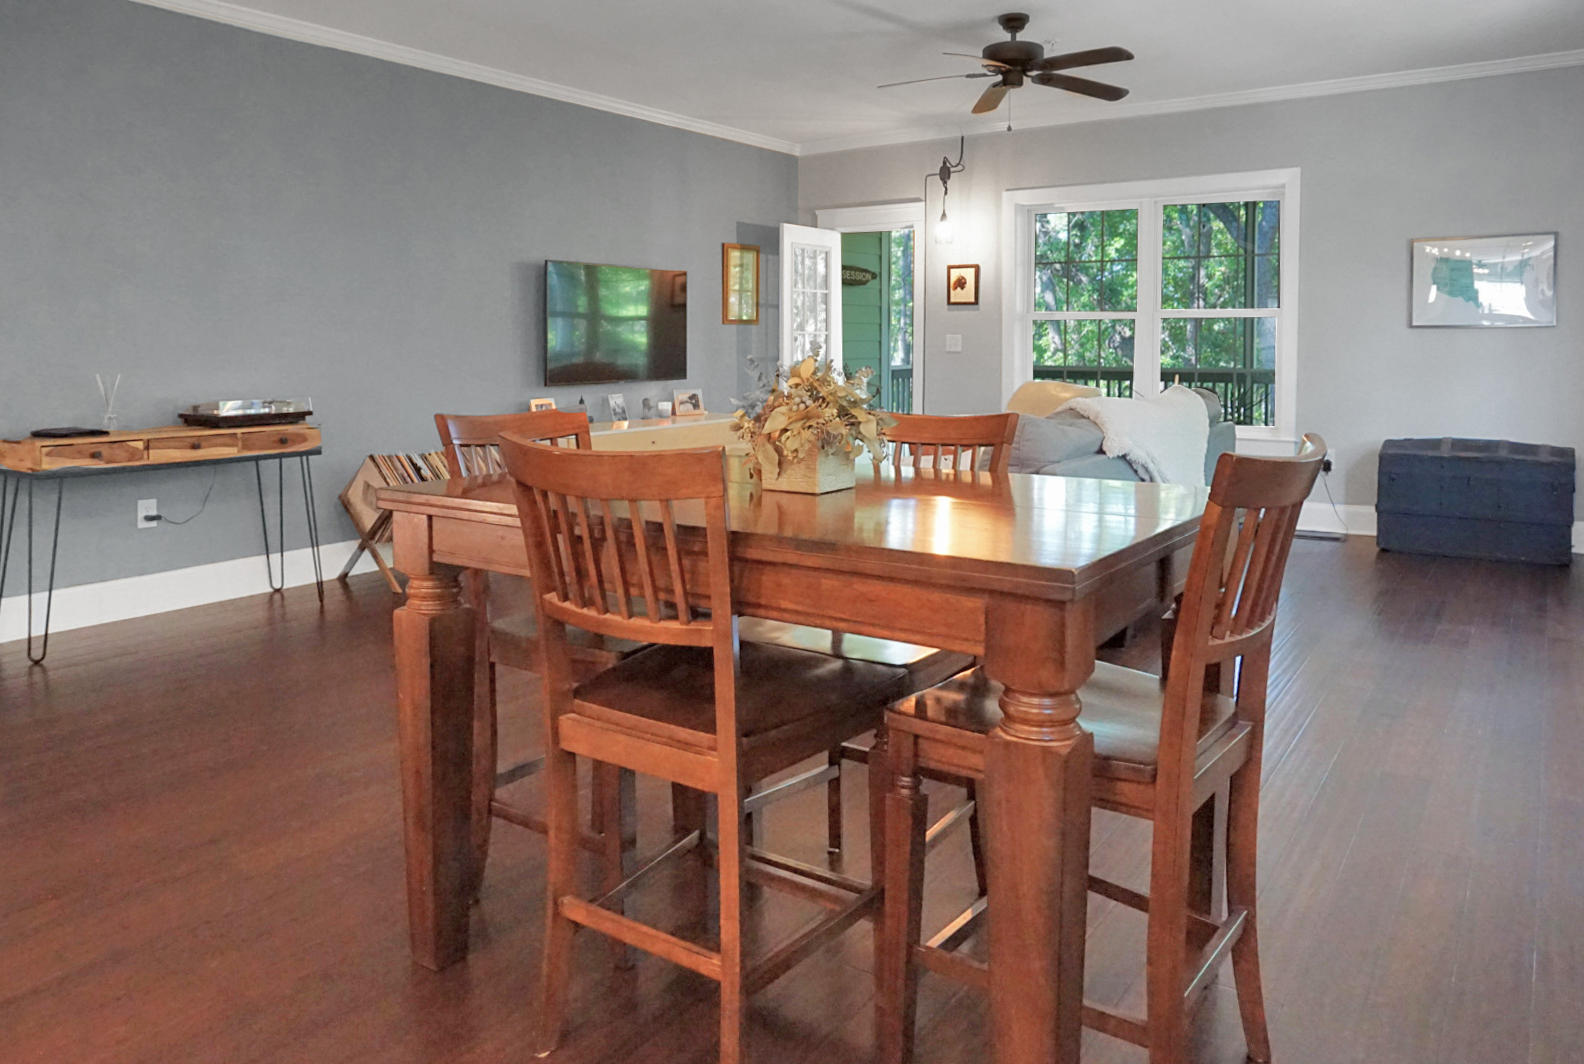 Etiwan Pointe Homes For Sale - 269 Etiwan Pointe, Mount Pleasant, SC - 55